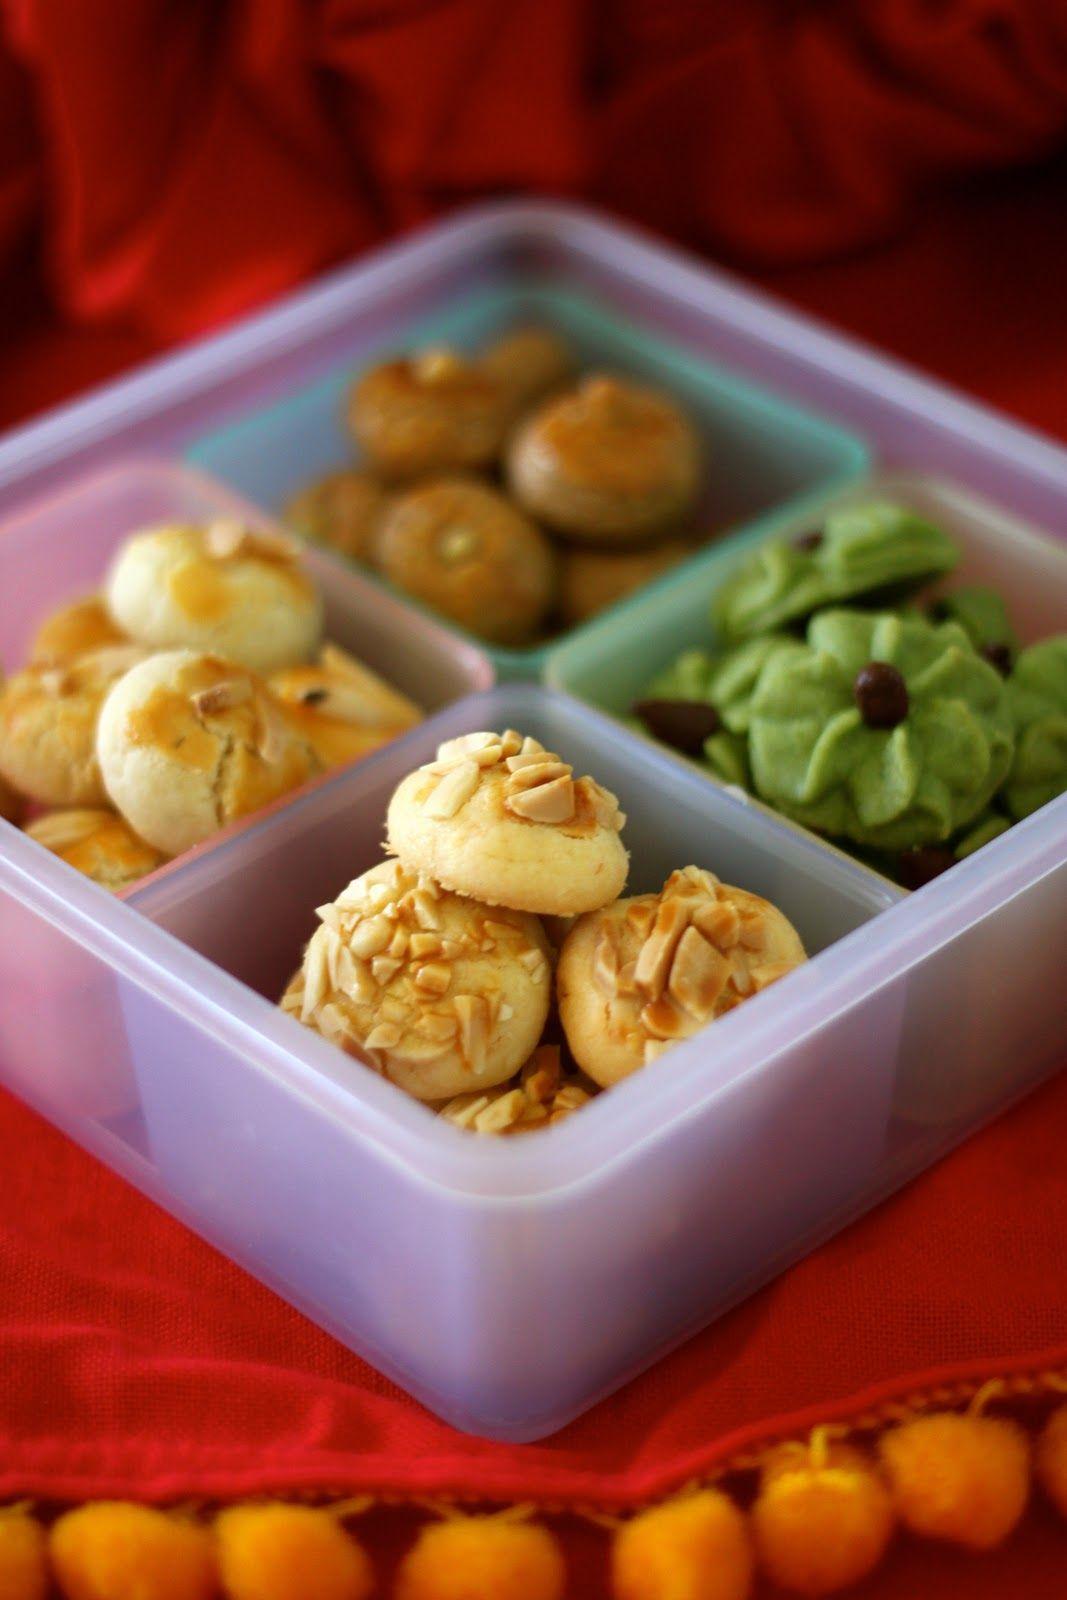 Jane's Corner 年饼(四款)CNY Cookies (4 types) Sugar cookies